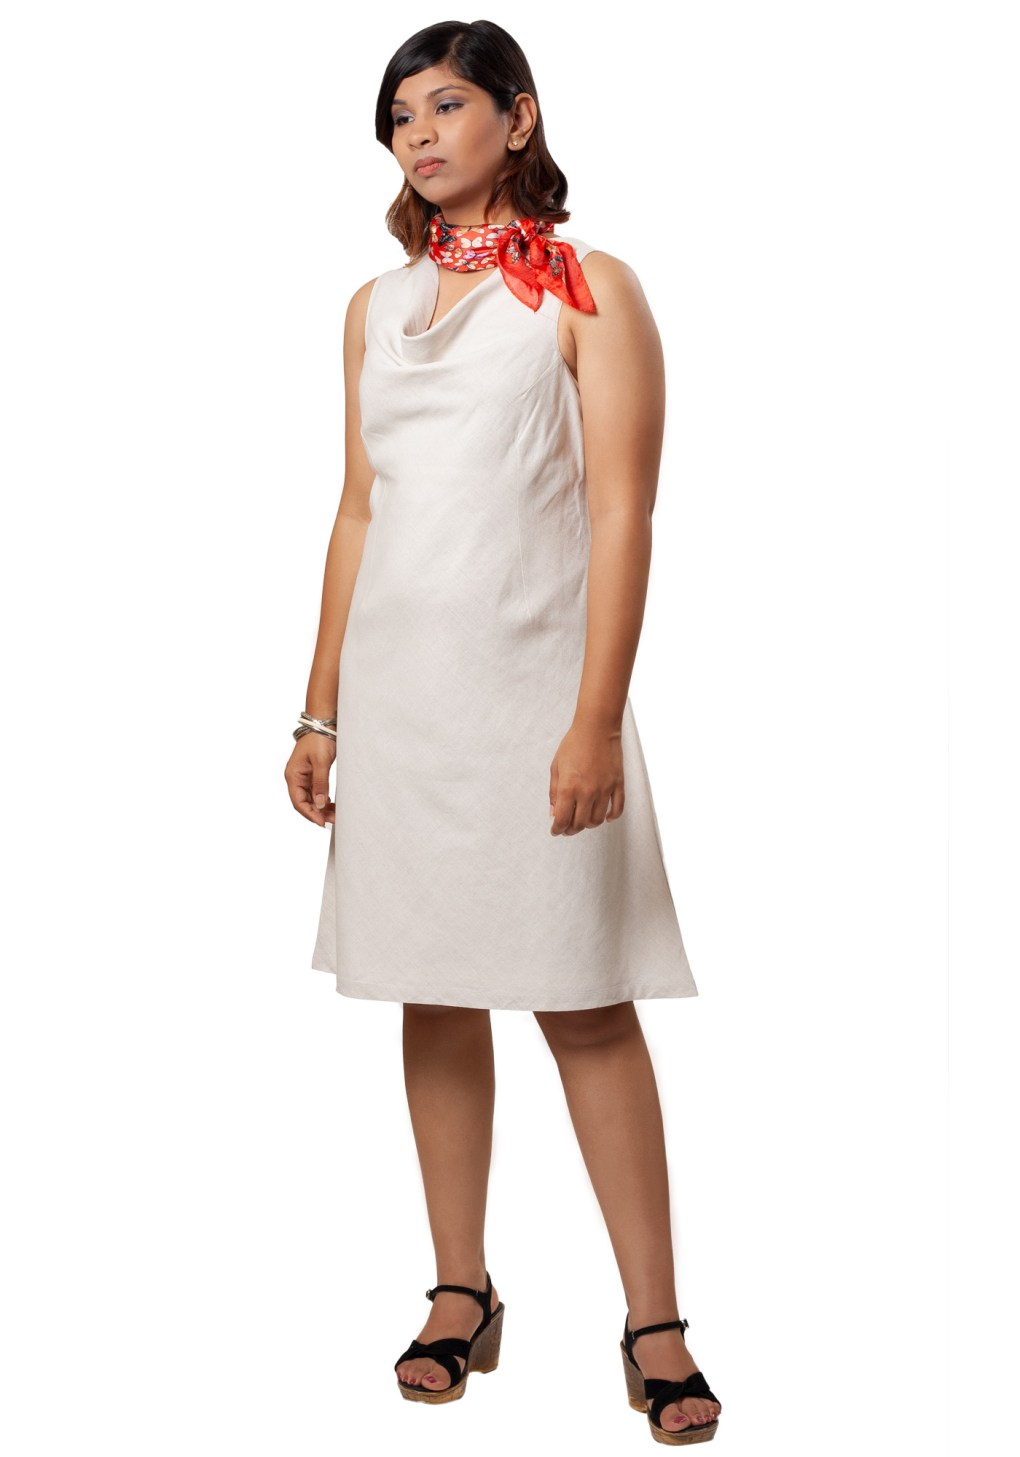 MINC ecofashion Elegant Off White Cowl Neck Dress in Linen